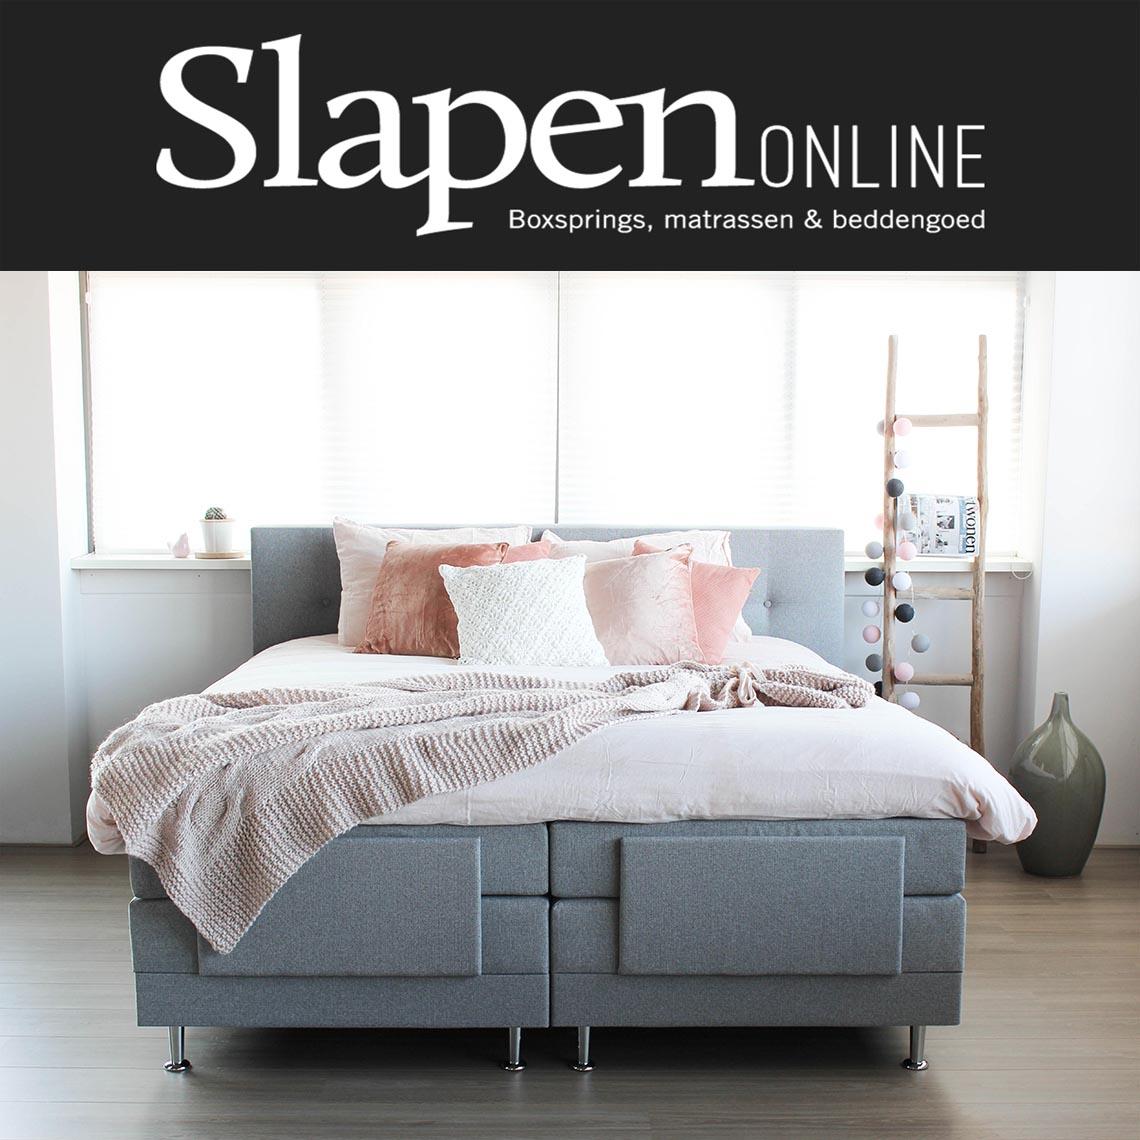 goedkope complete boxspring 120x200 slapen online. Black Bedroom Furniture Sets. Home Design Ideas